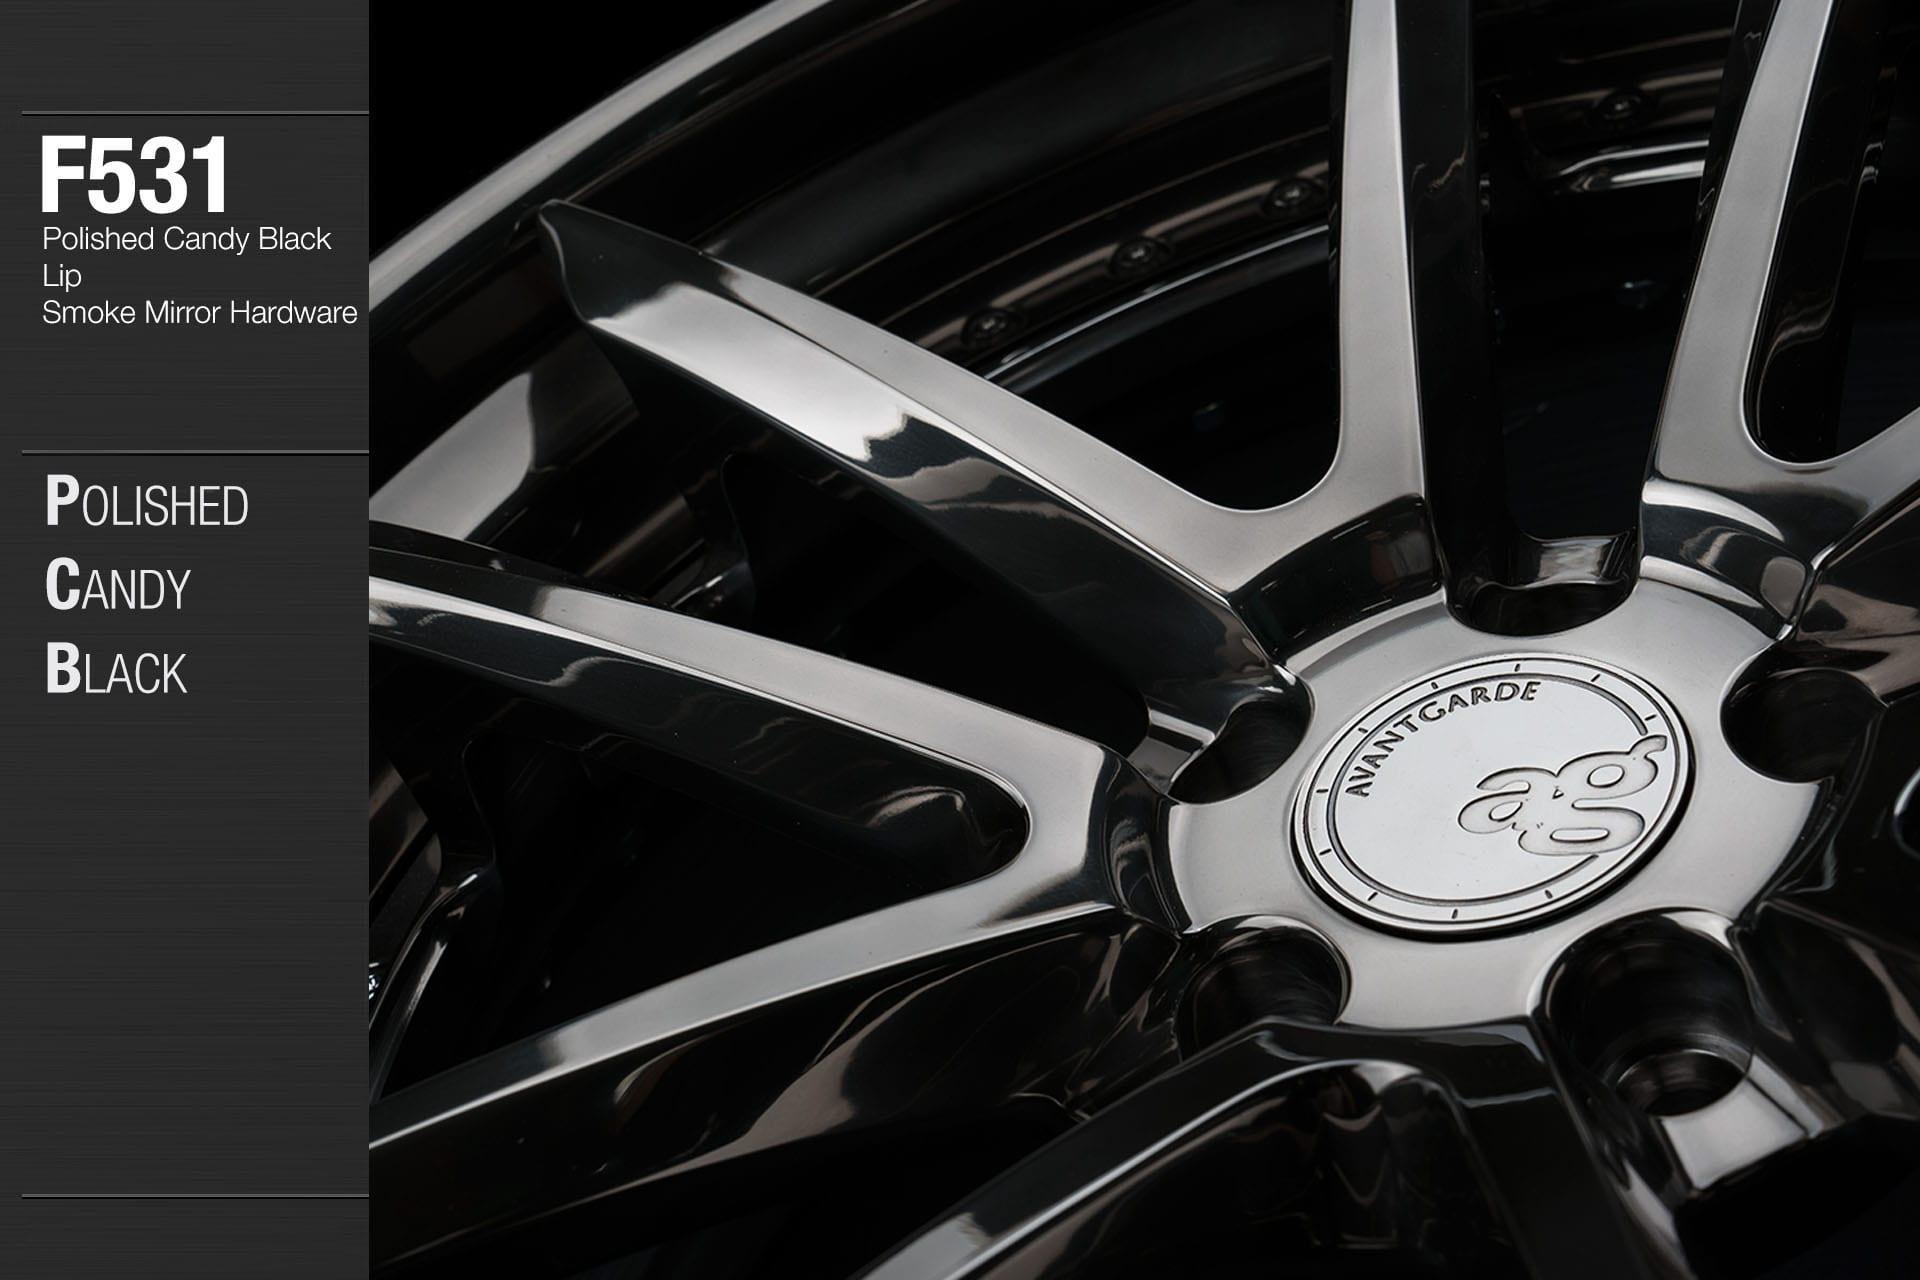 avant-garde-ag-wheels-f531-polished-candy-black-face-lip-smoke-mirror-hardware-2-min